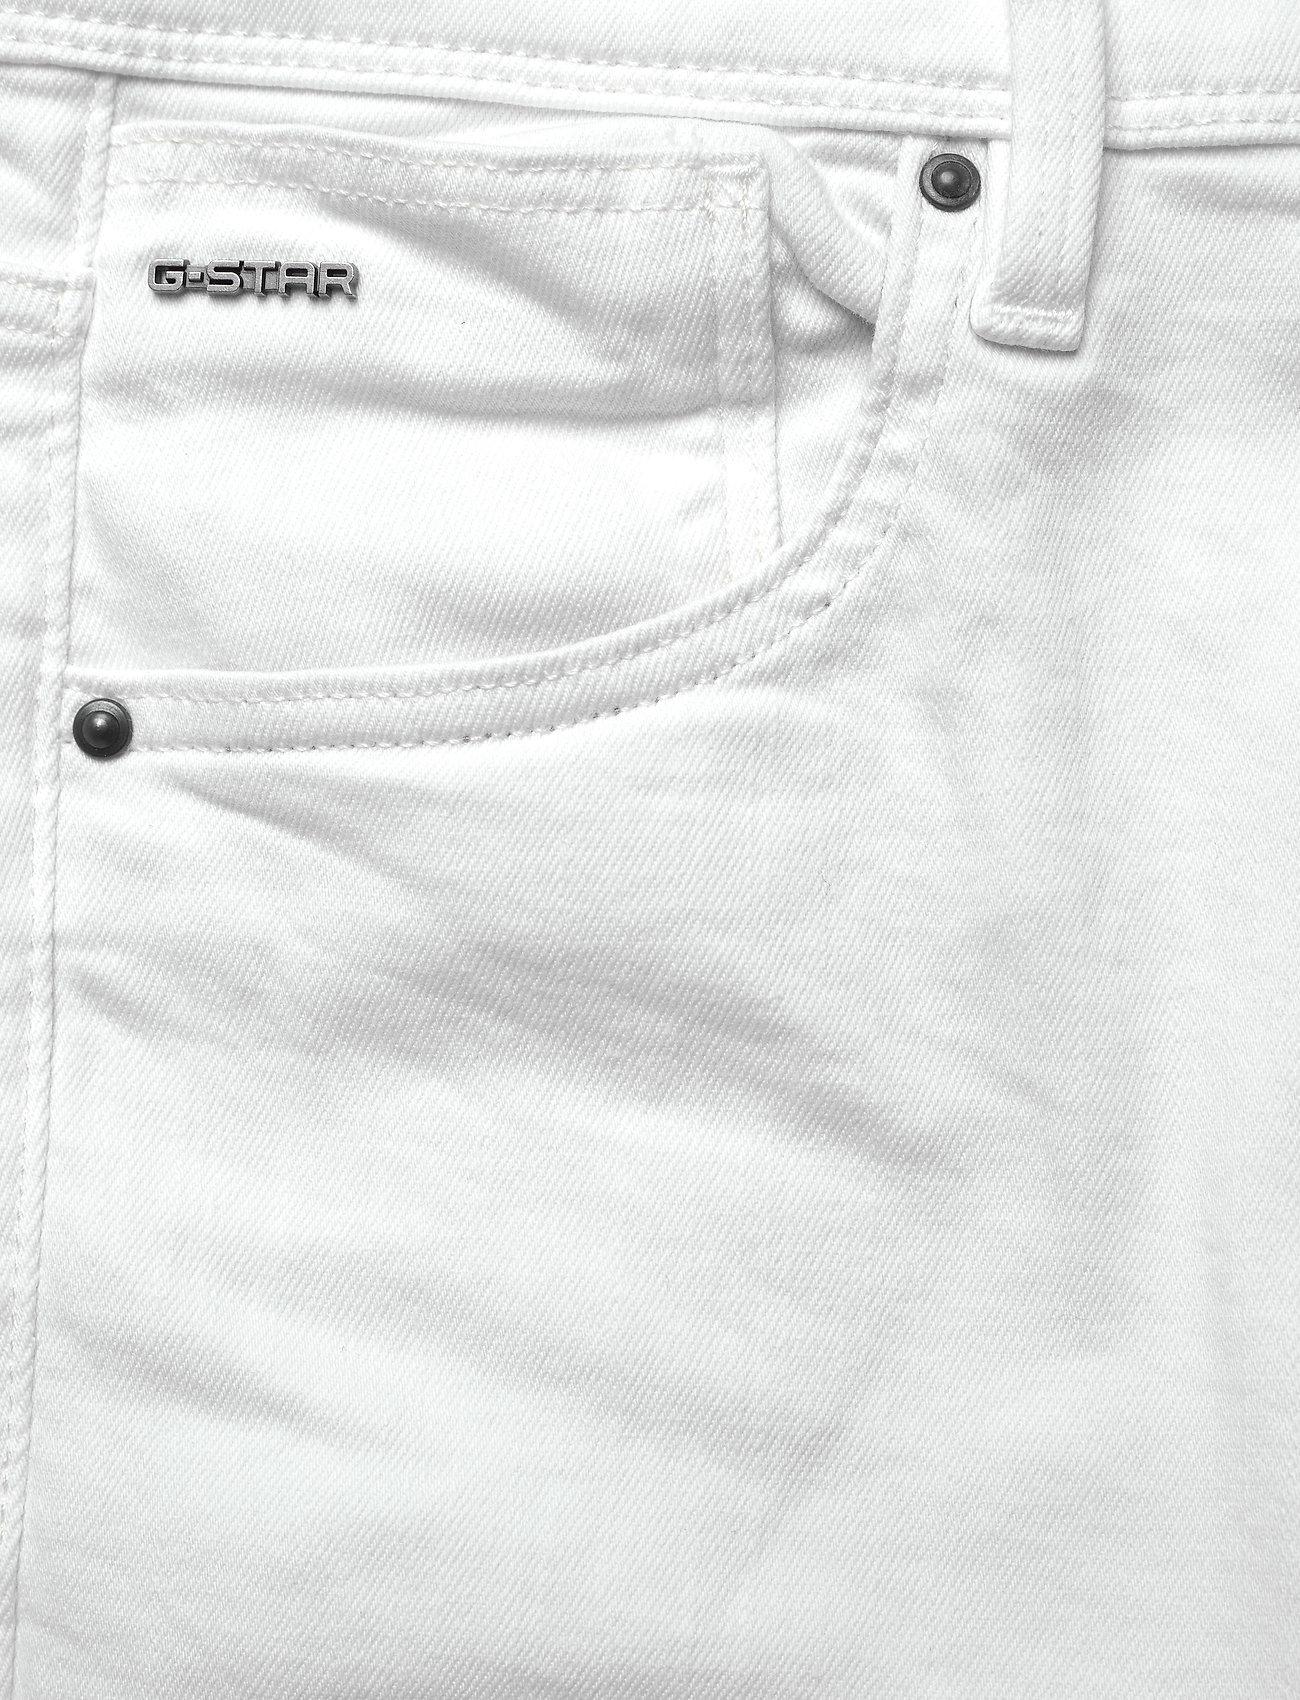 G-star RAW - Kafey Ultra High Skinny Wmn - skinny jeans - white - 3